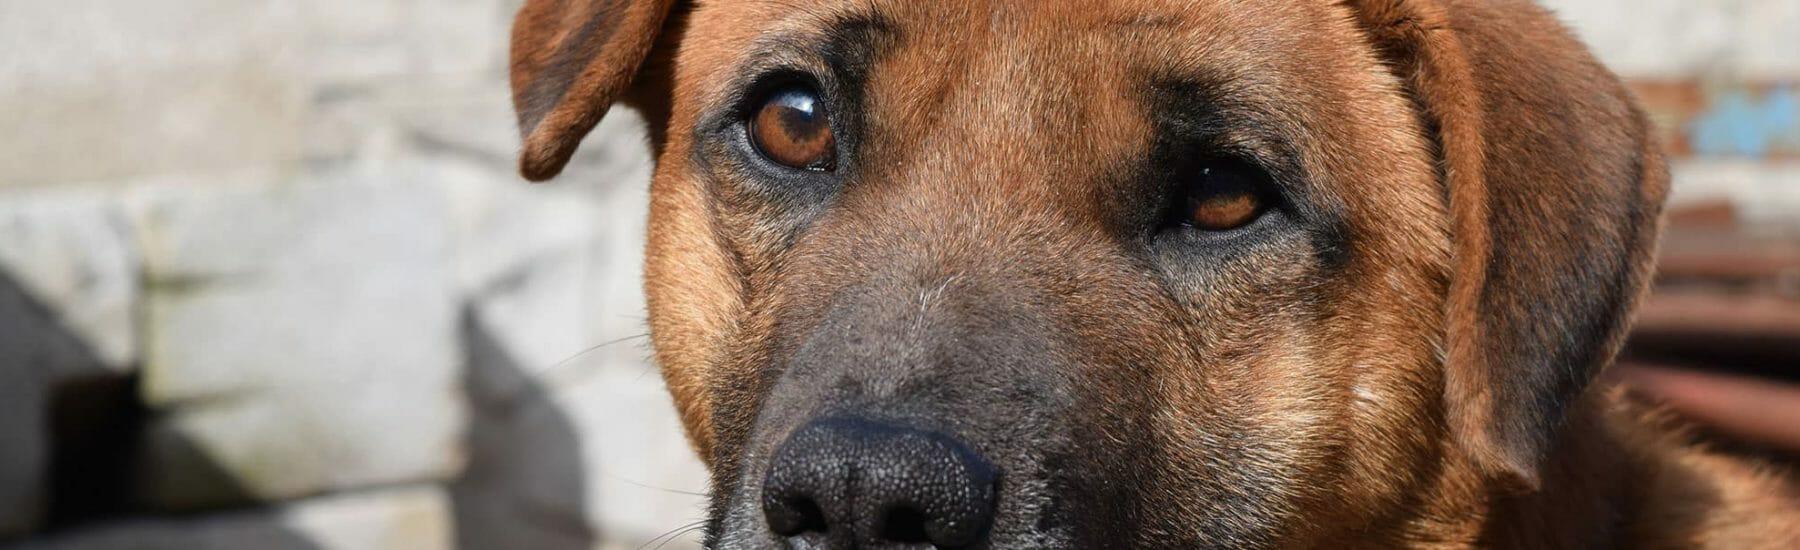 Older brown dog looking towards camera